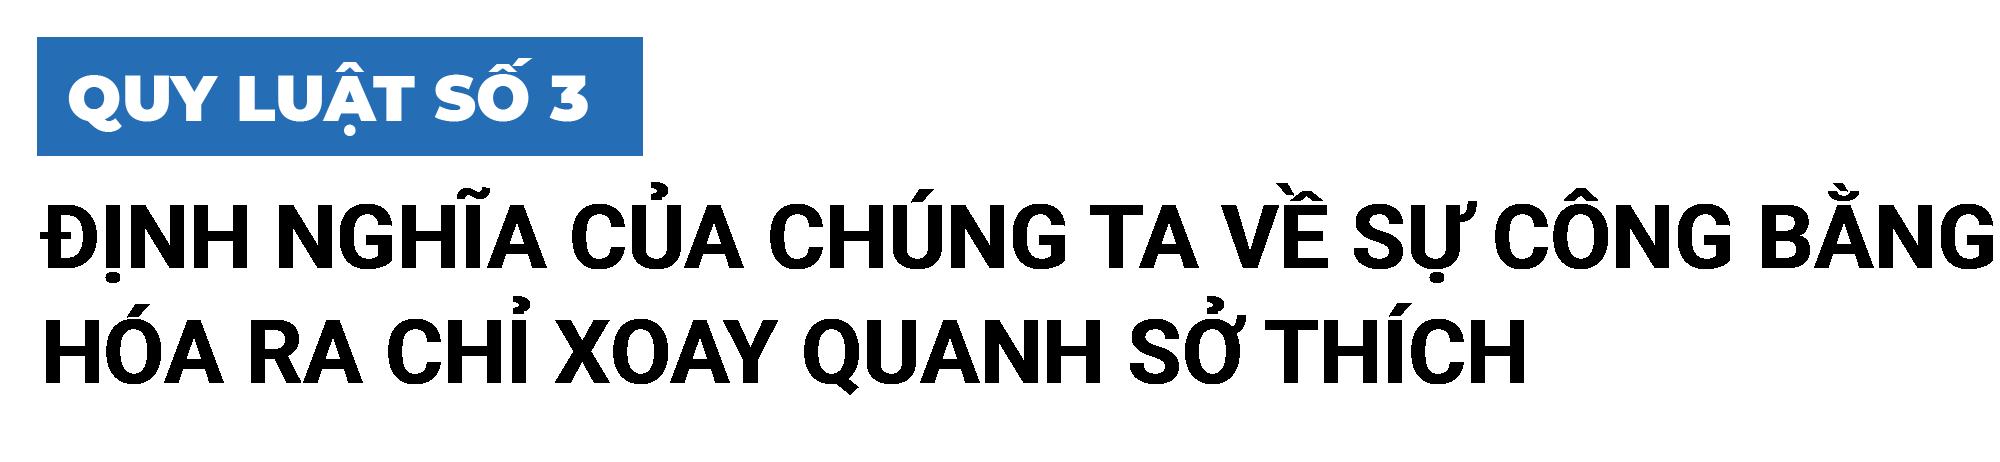 bi-quyet-thanh-cong-6